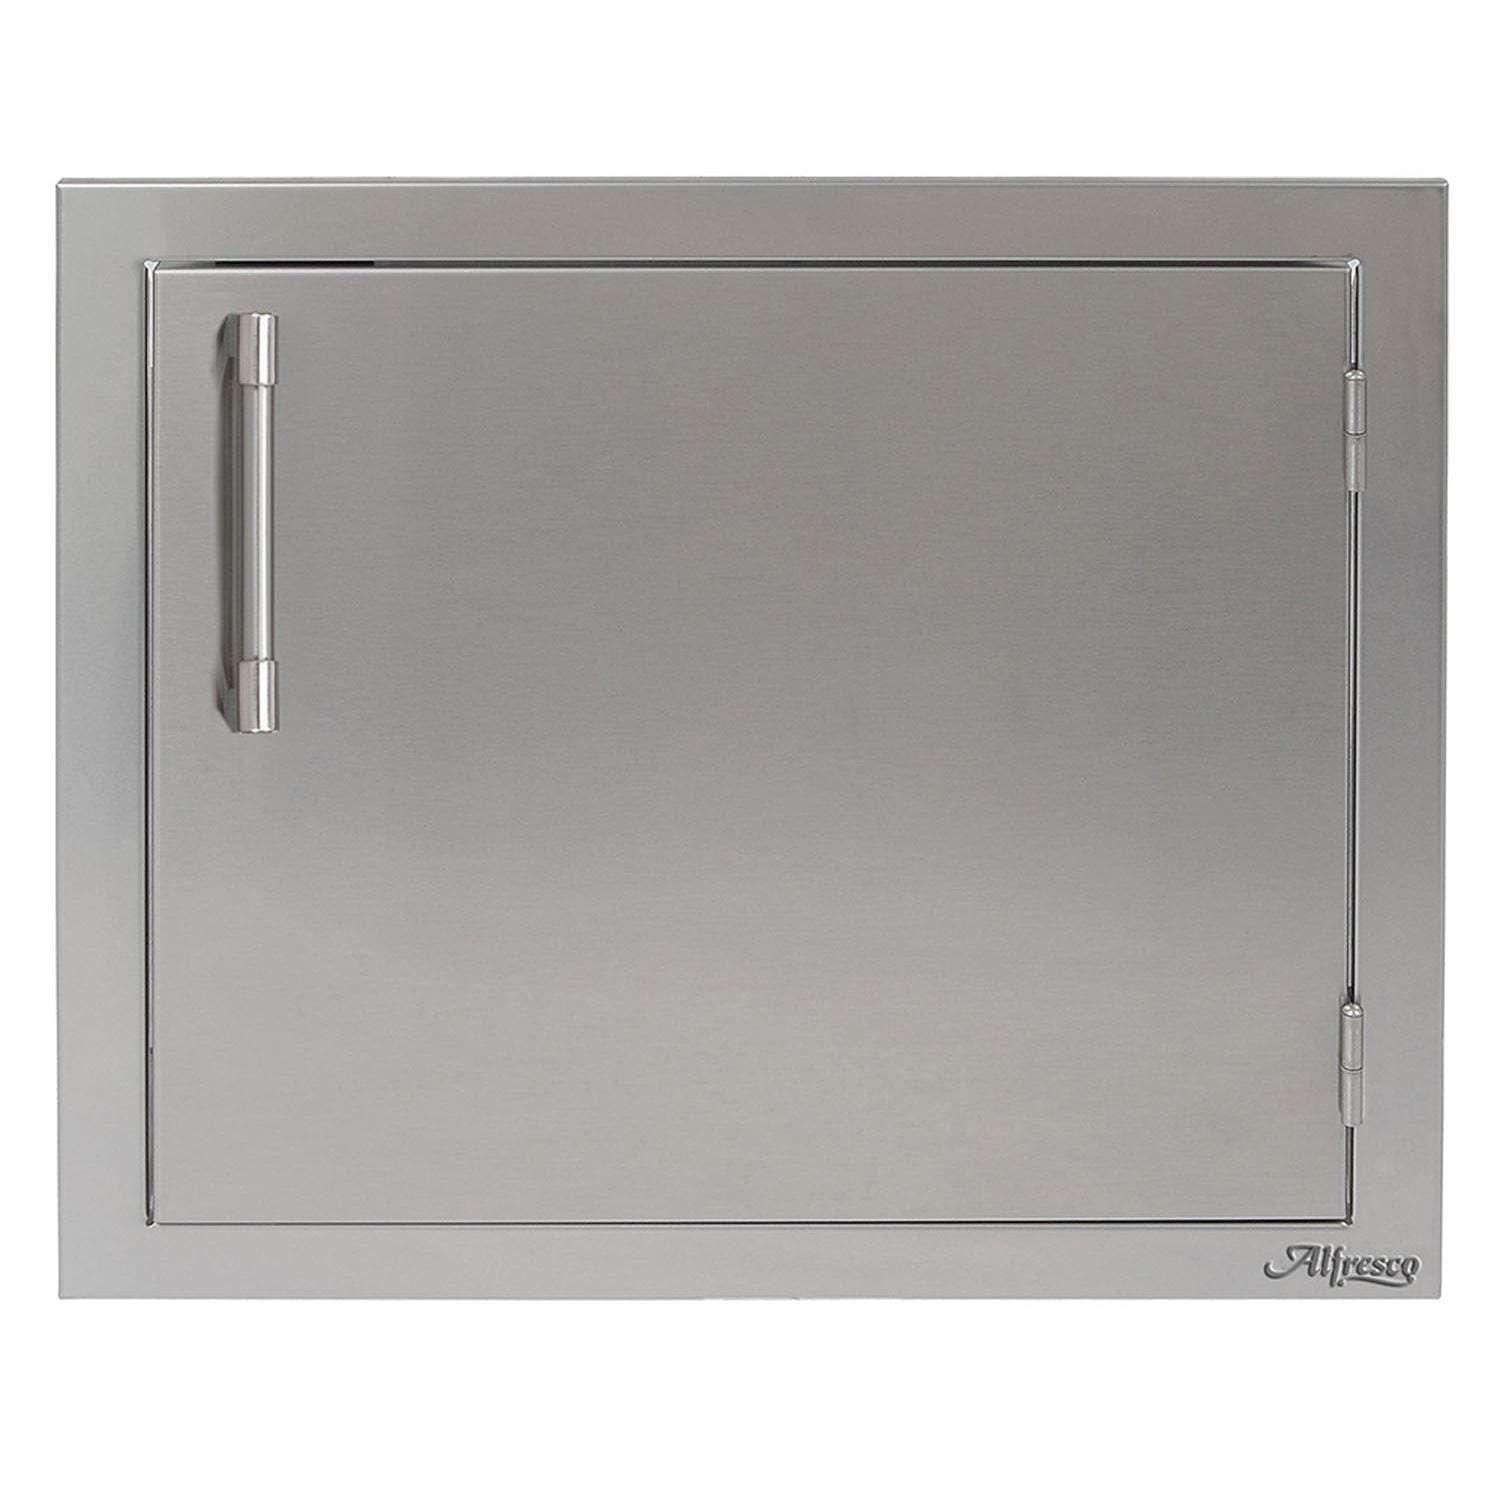 Alfresco 23-Inch Right-Hinged Single Access Door